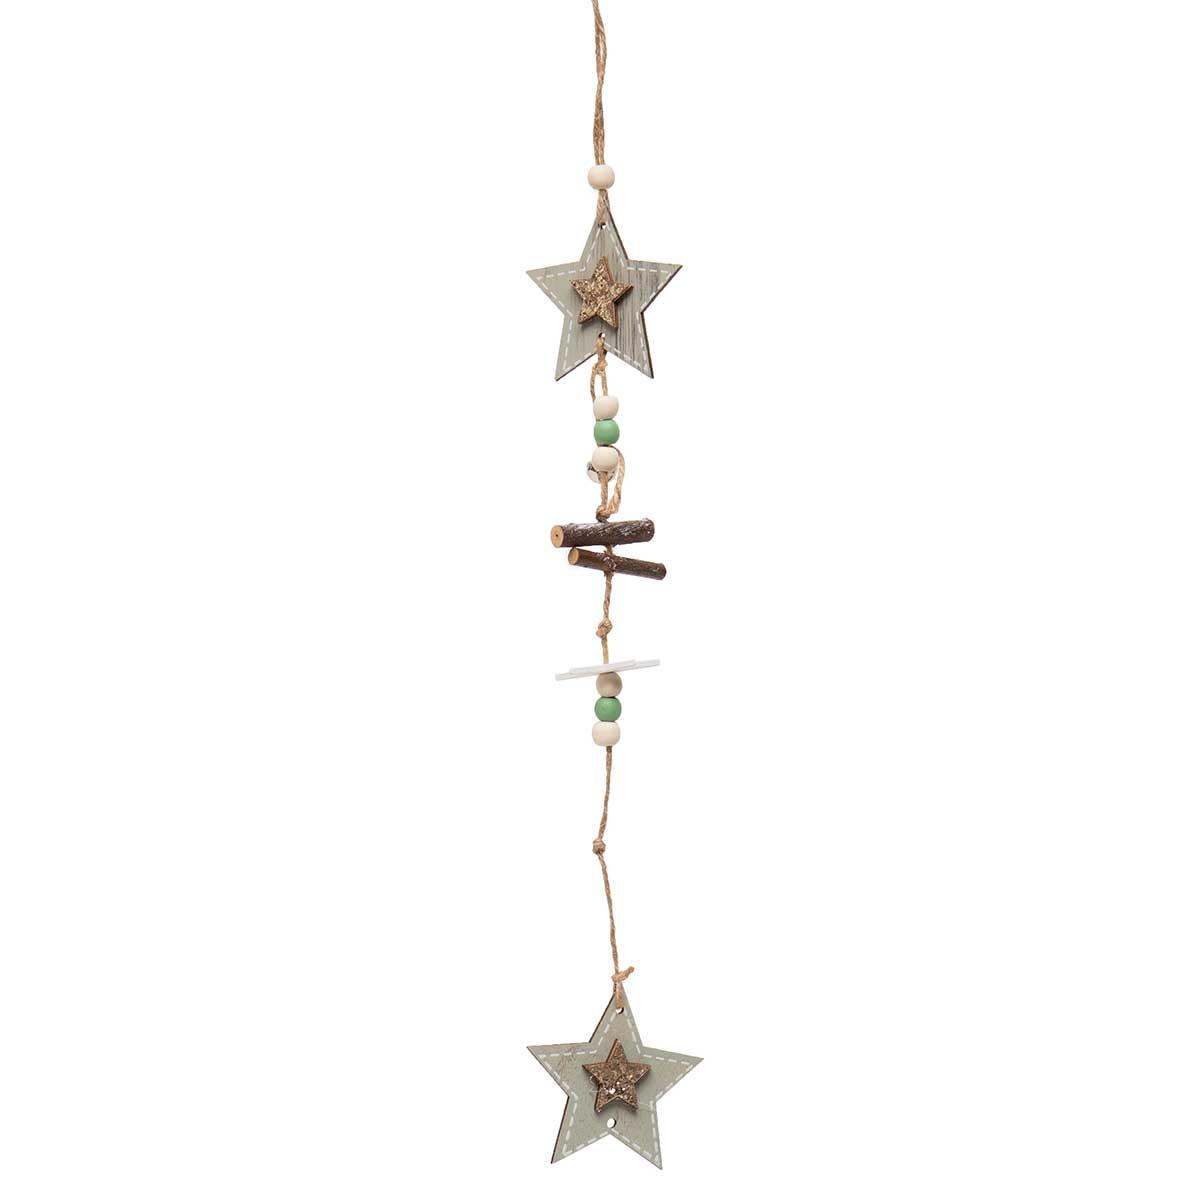 LIGHT GREEN WOOD STAR WITH BEADS, JINGLE